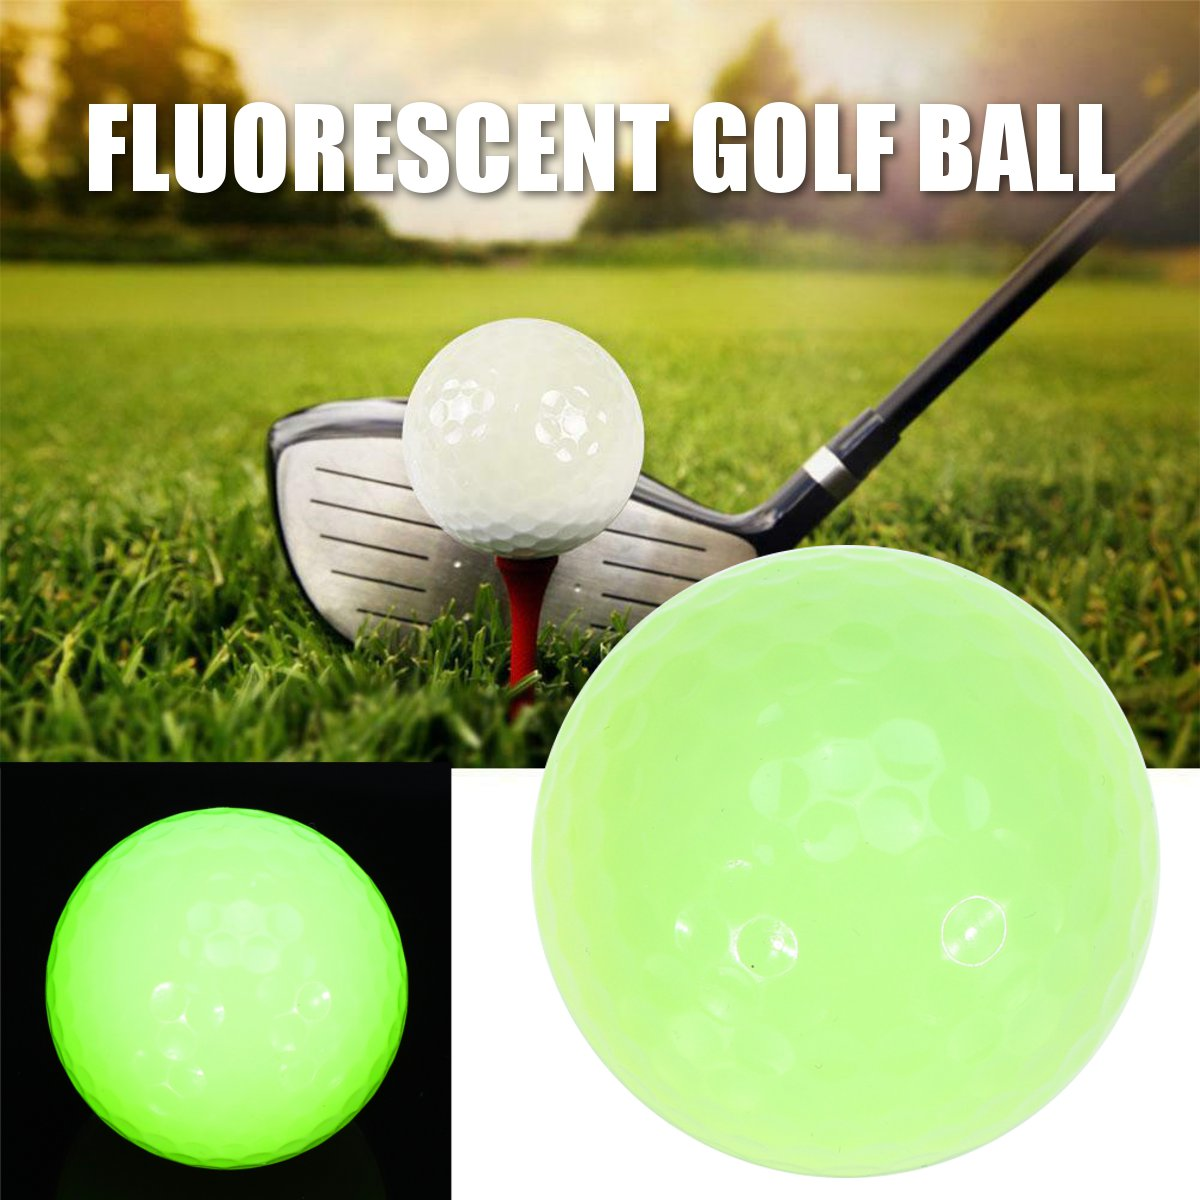 1 Pcs Luminous Golf Ball Bright Ball For Night Use Golf Training Balls Outdoor Indoor Practice Golf Balls Golf Accessories